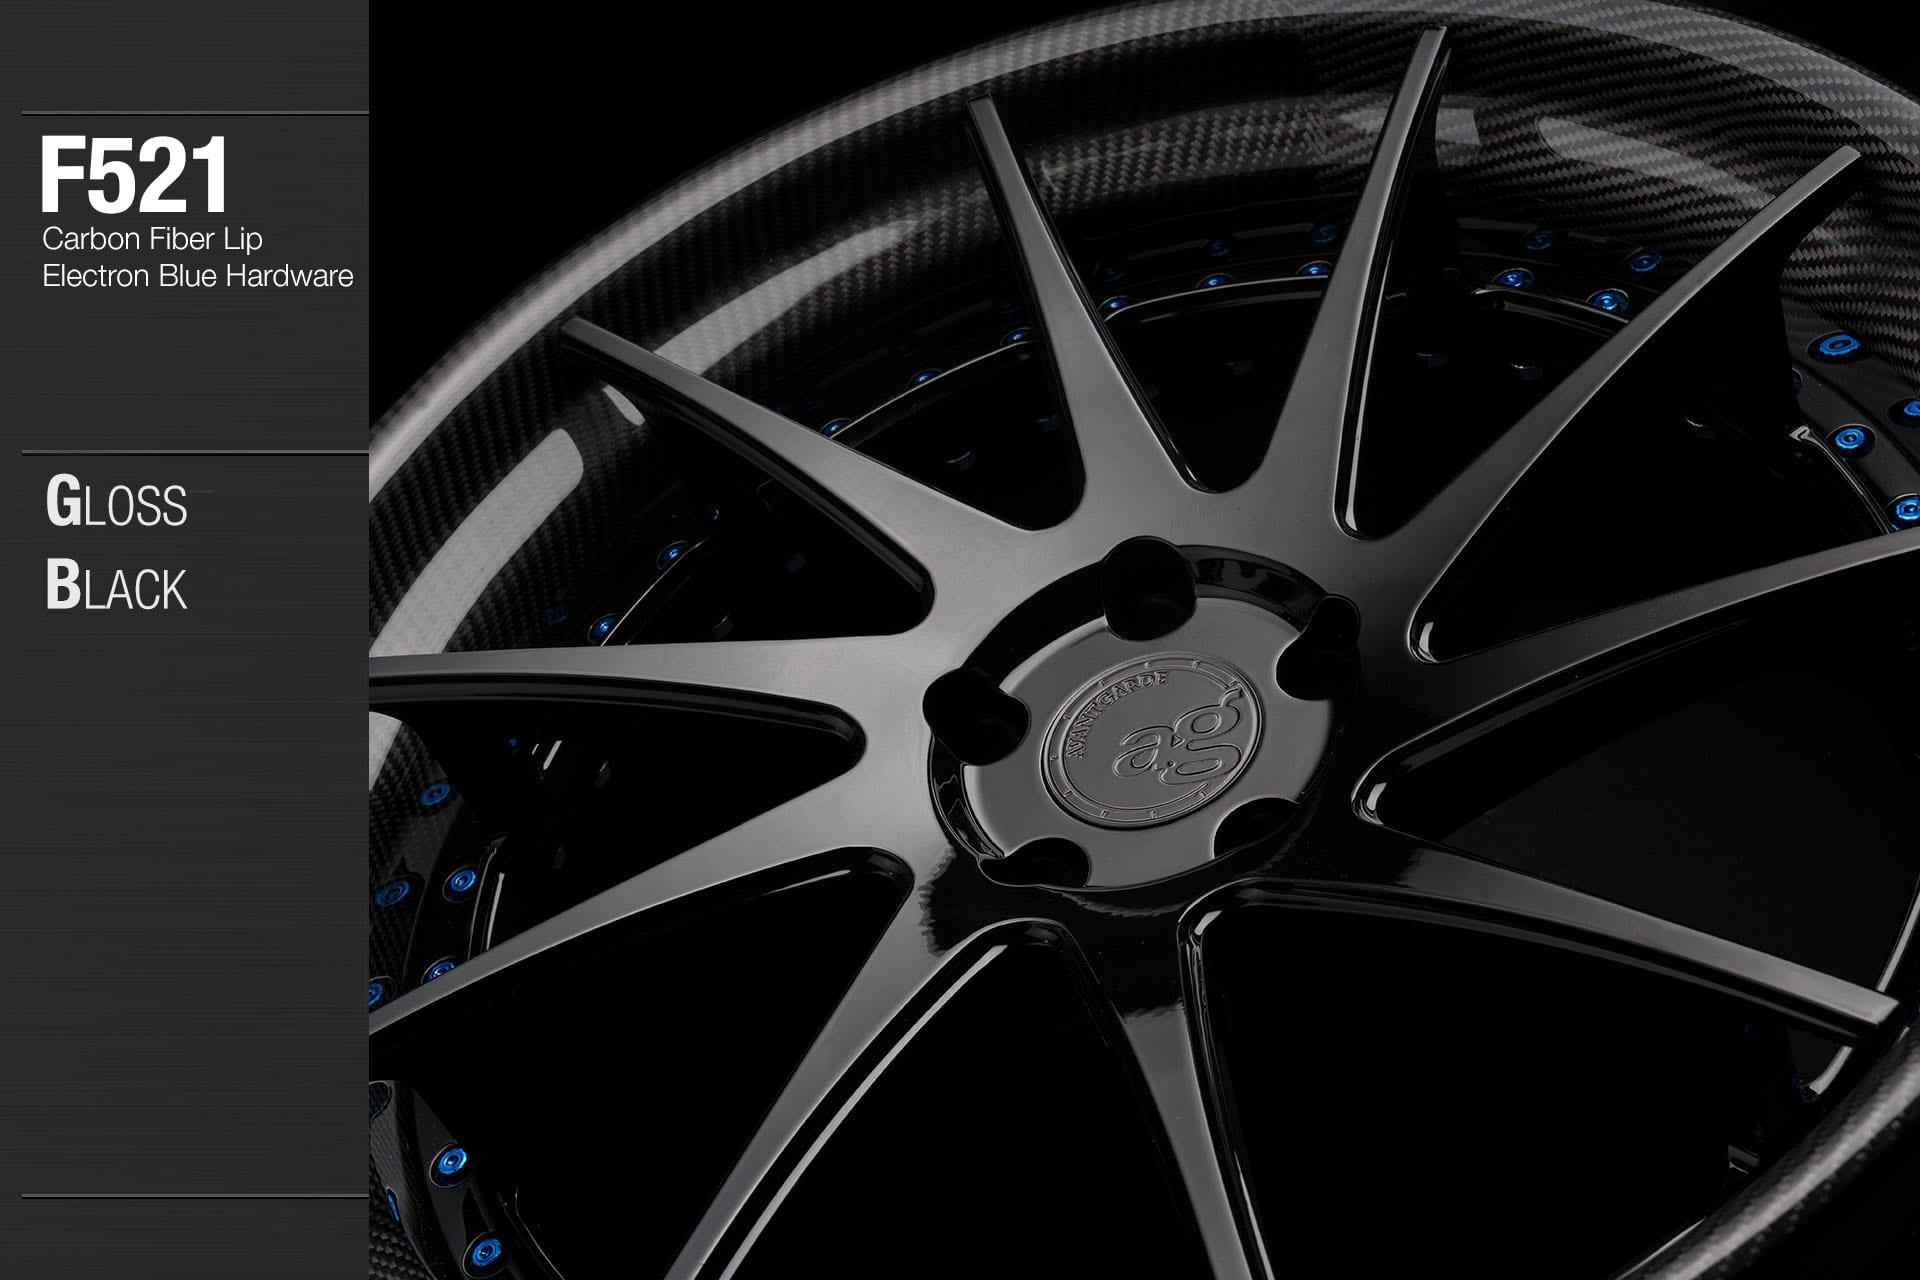 avant garde f521 gloss black center carbon fiber lip electron blue hardware